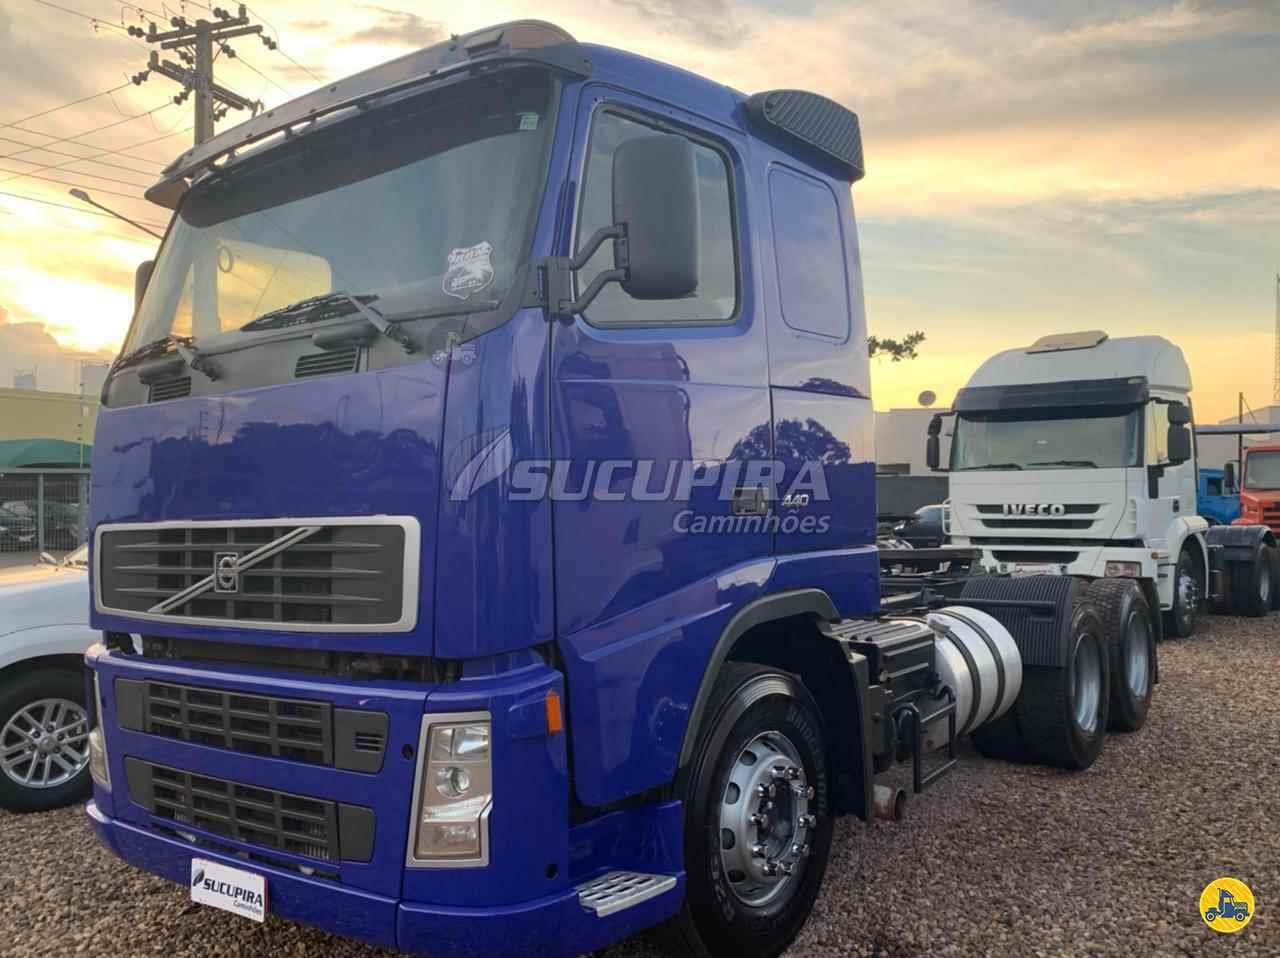 VOLVO FH 440 de Sucupira Caminhões - RONDONOPOLIS/MT